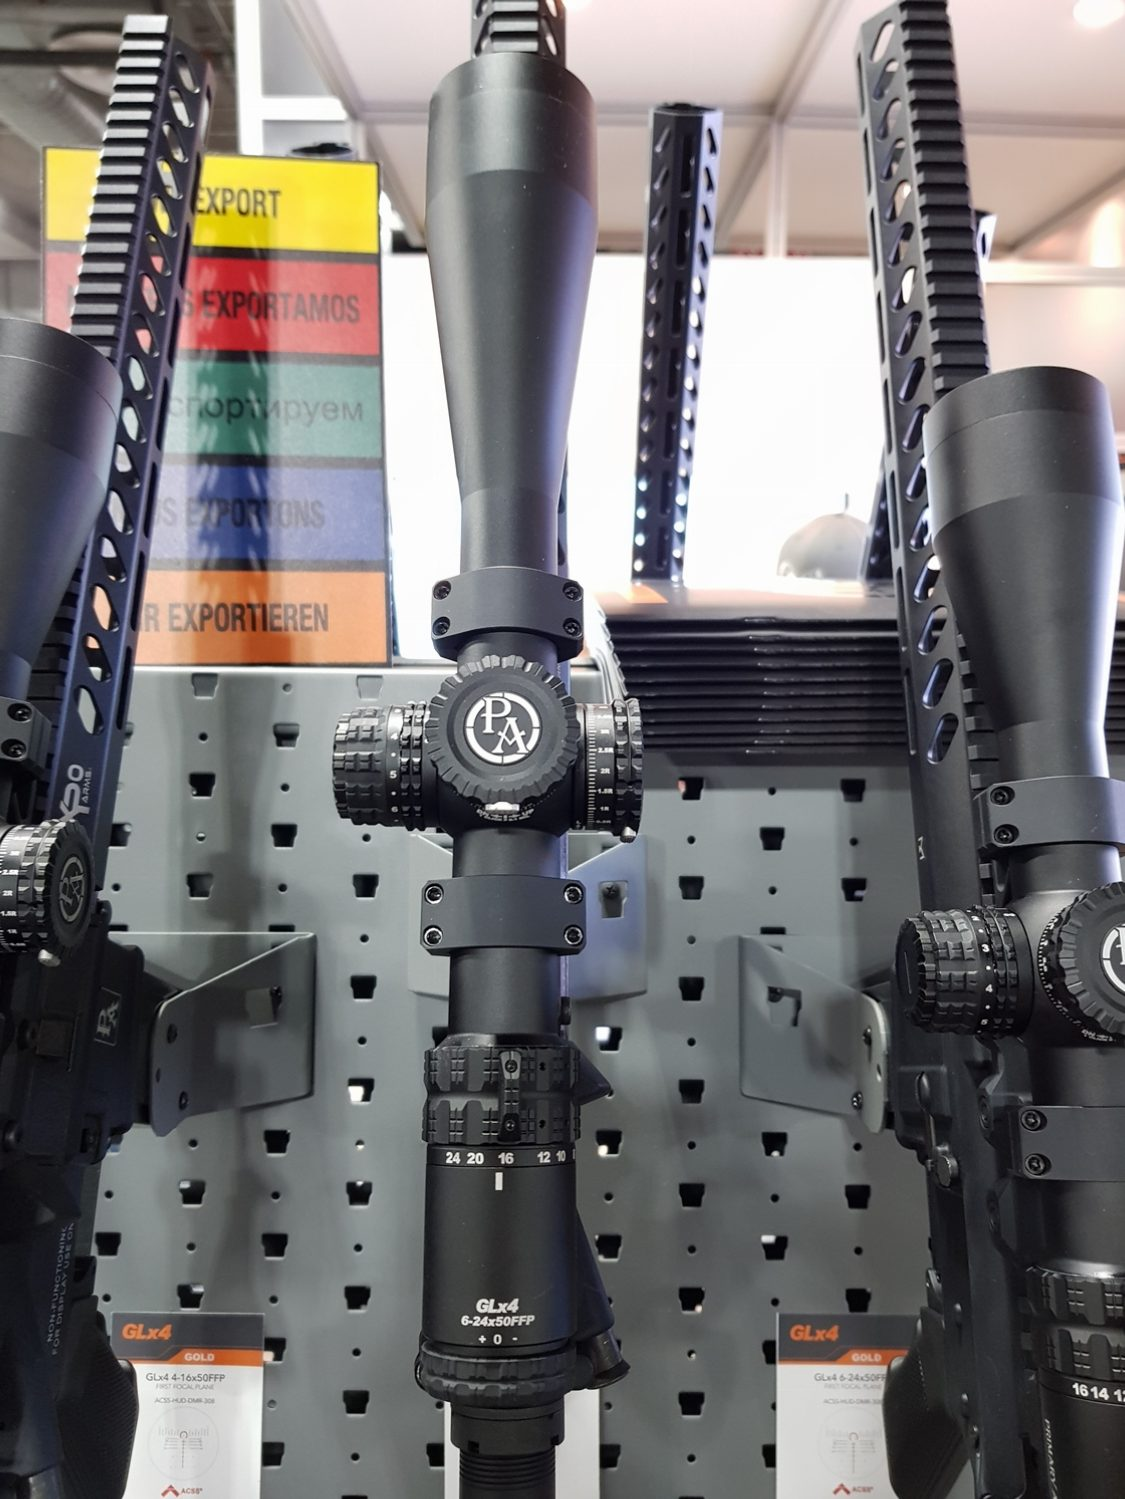 Primary Arms GLx 6-24x50 FFP